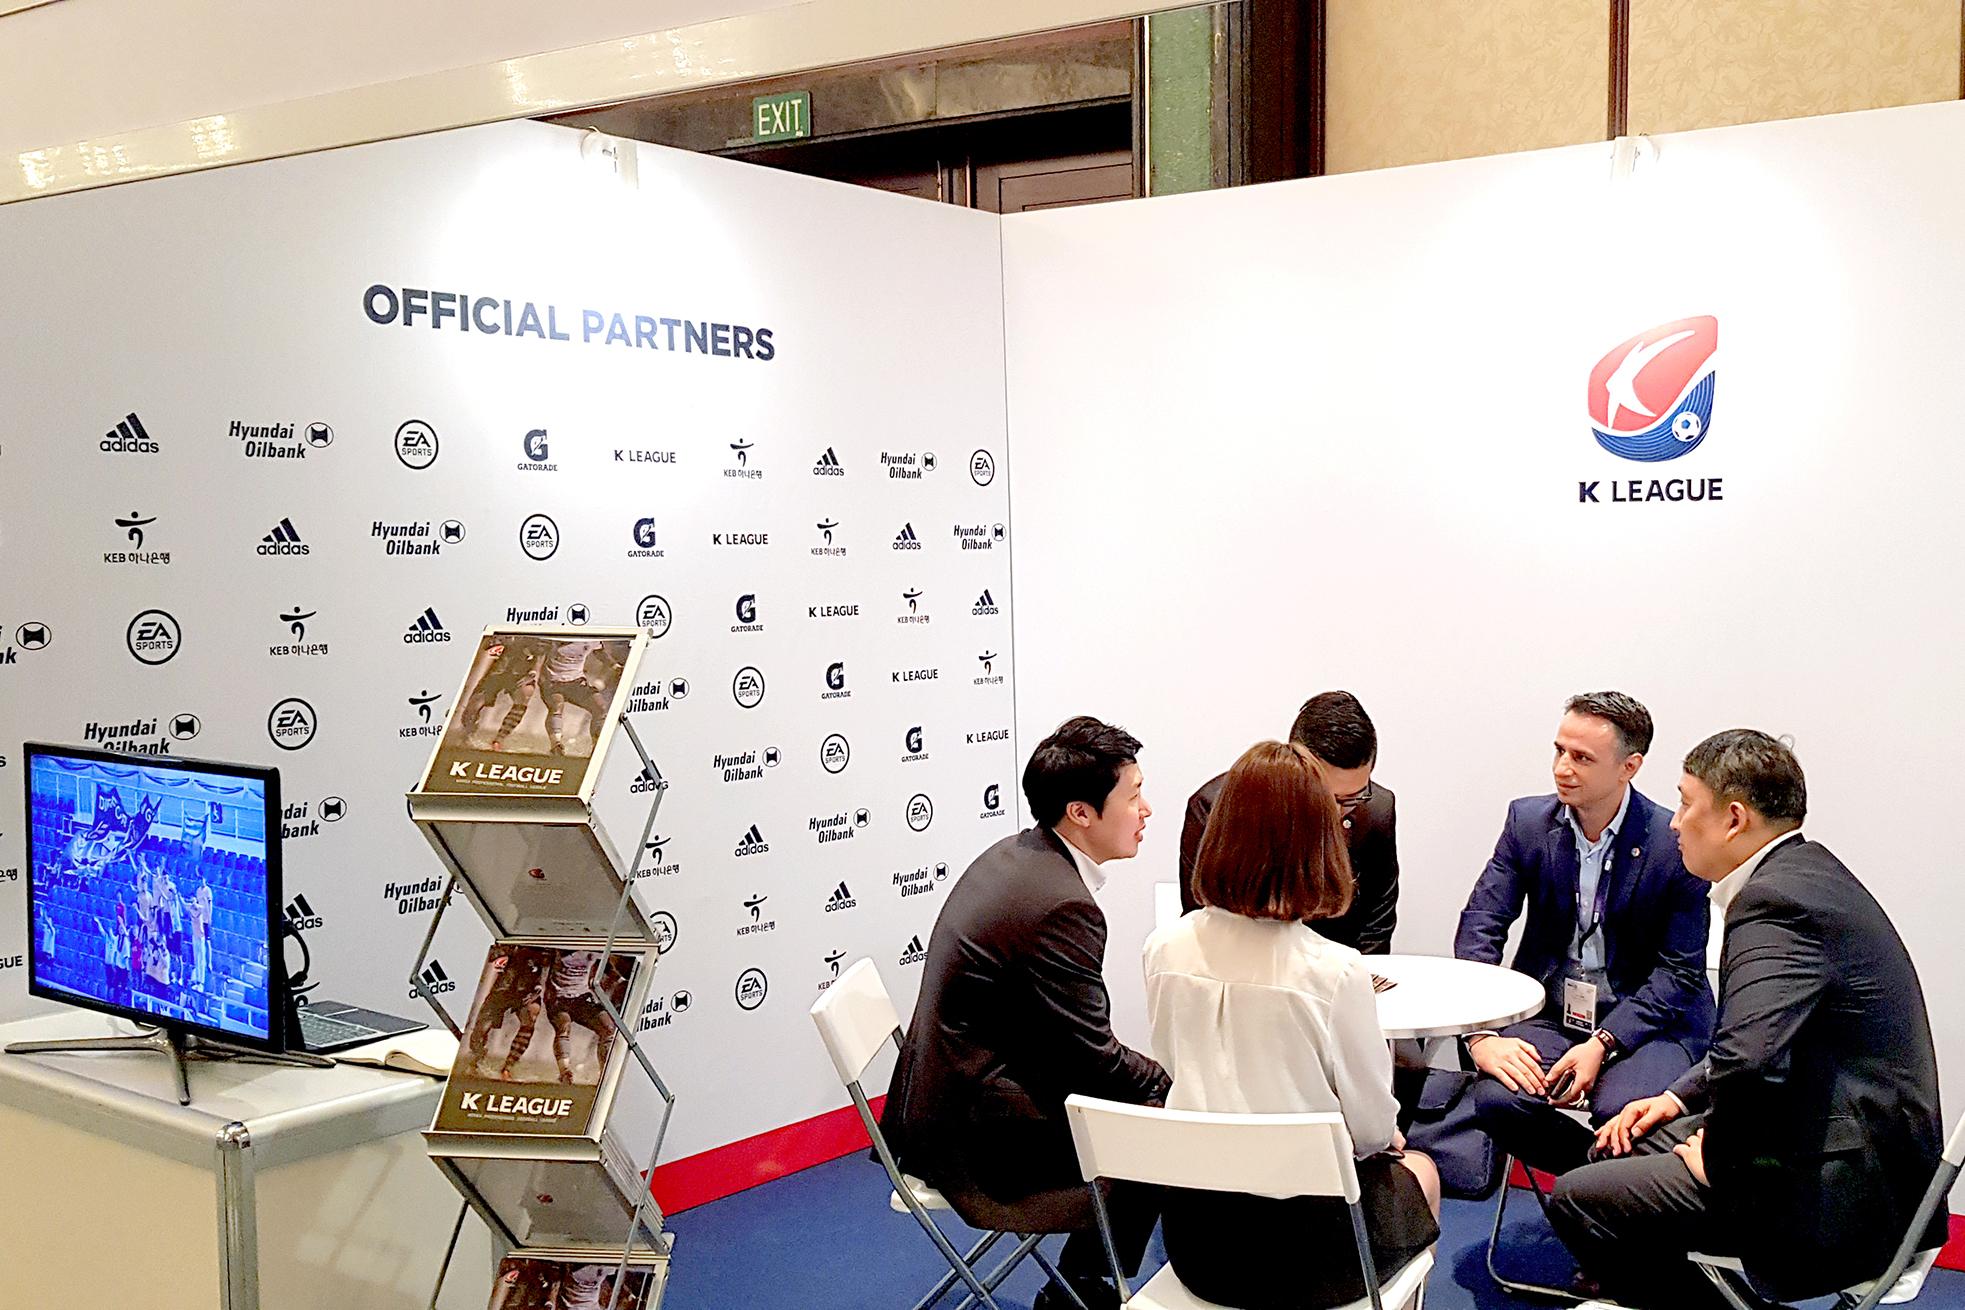 K리그, 亞 최대 스포츠 산업 박람회 'SPORTEL ASIA' 참가_이미지